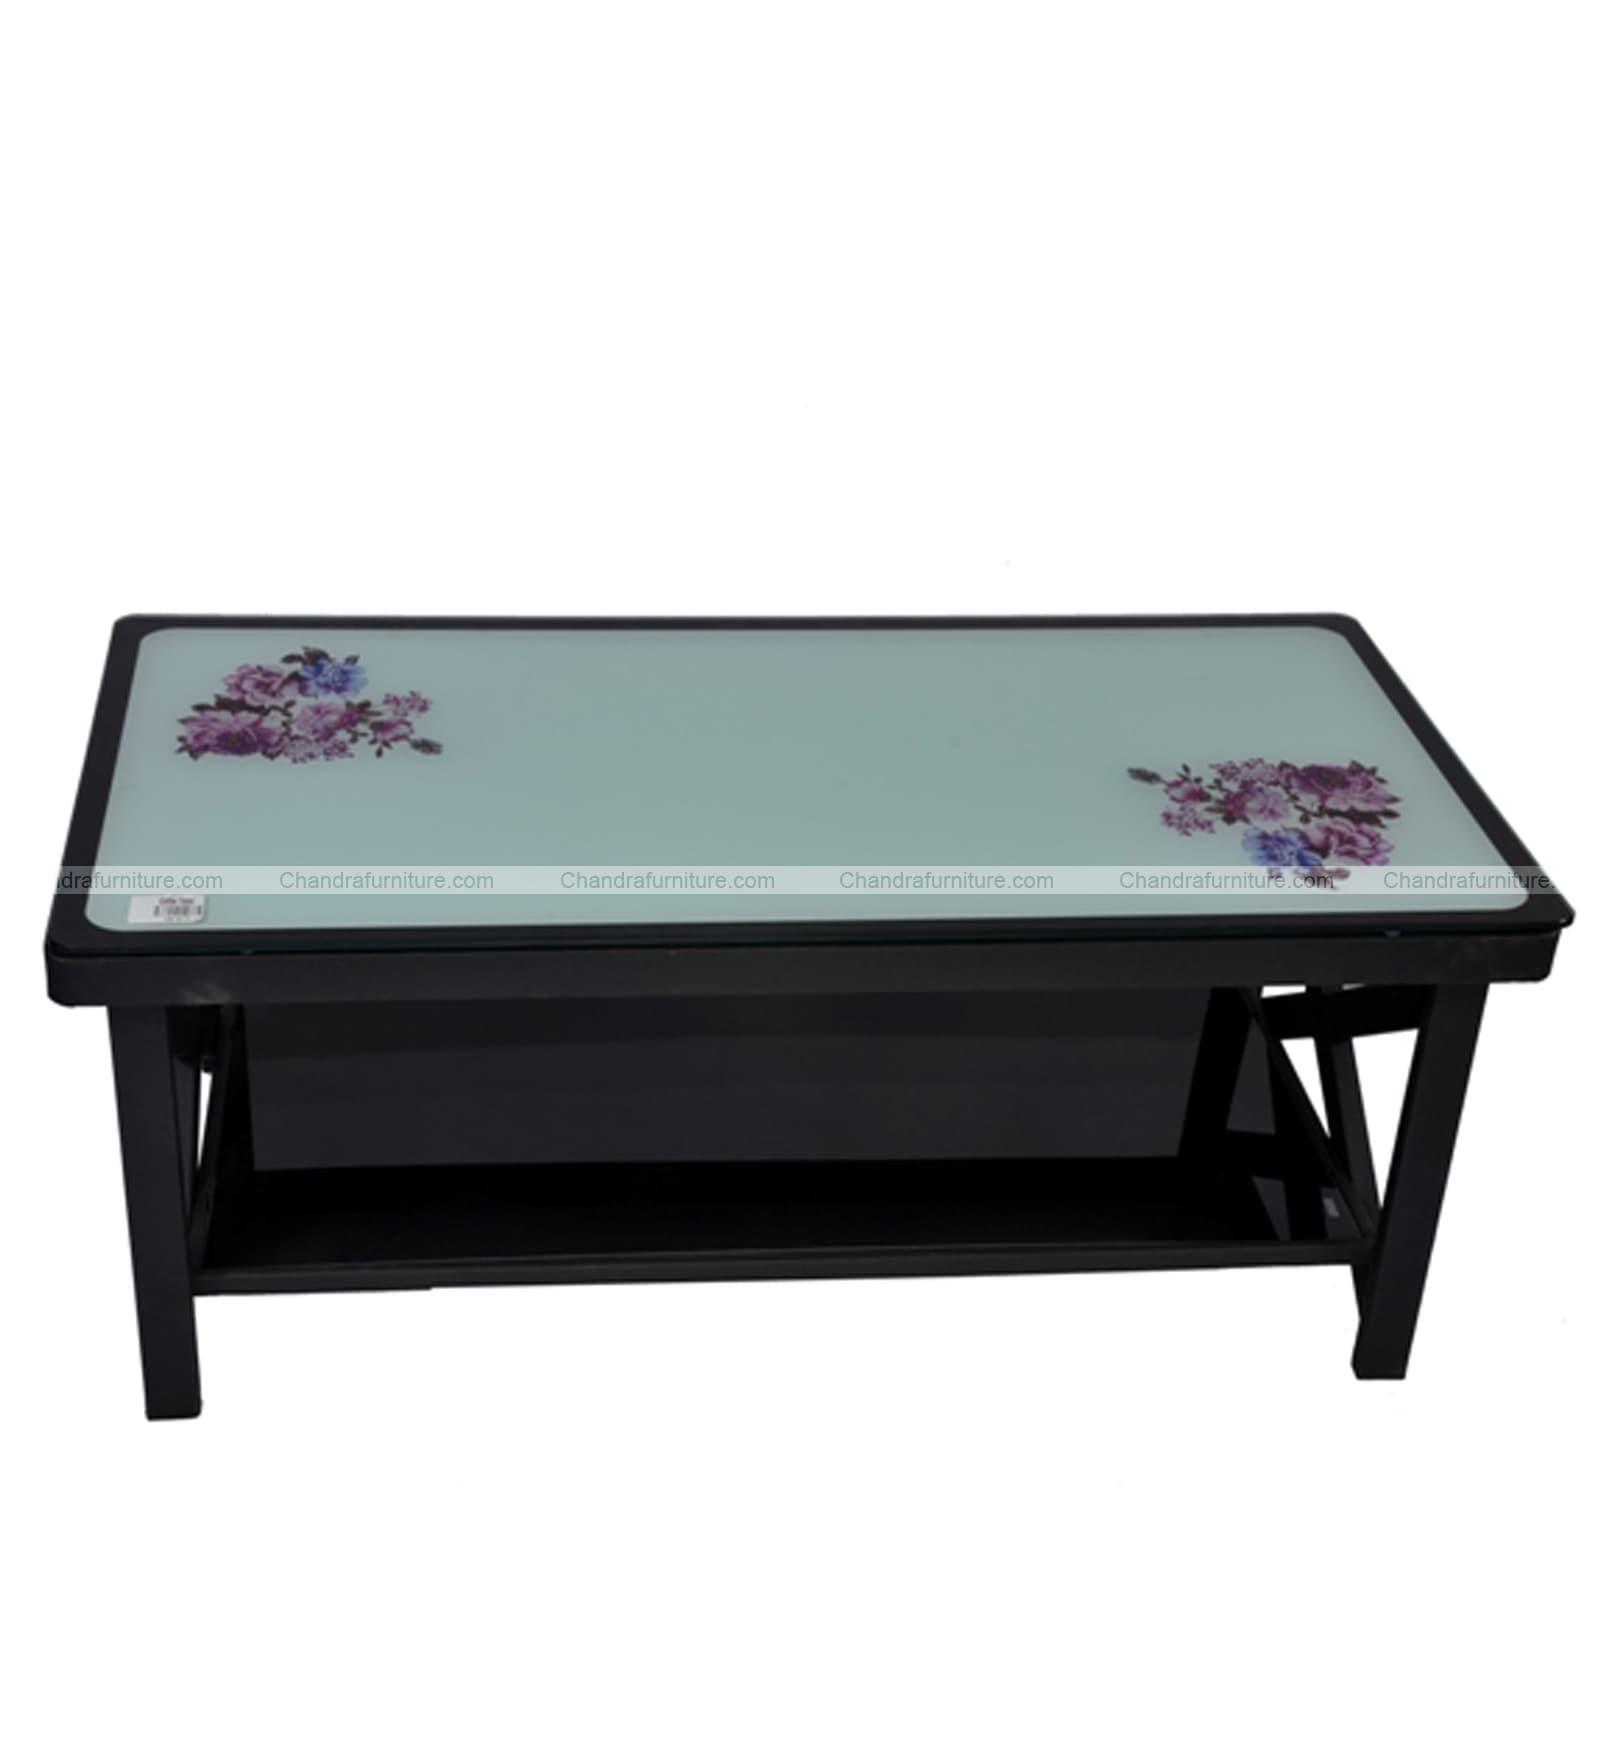 CHANDRA FURNITURE CENTER TABLE  135-1